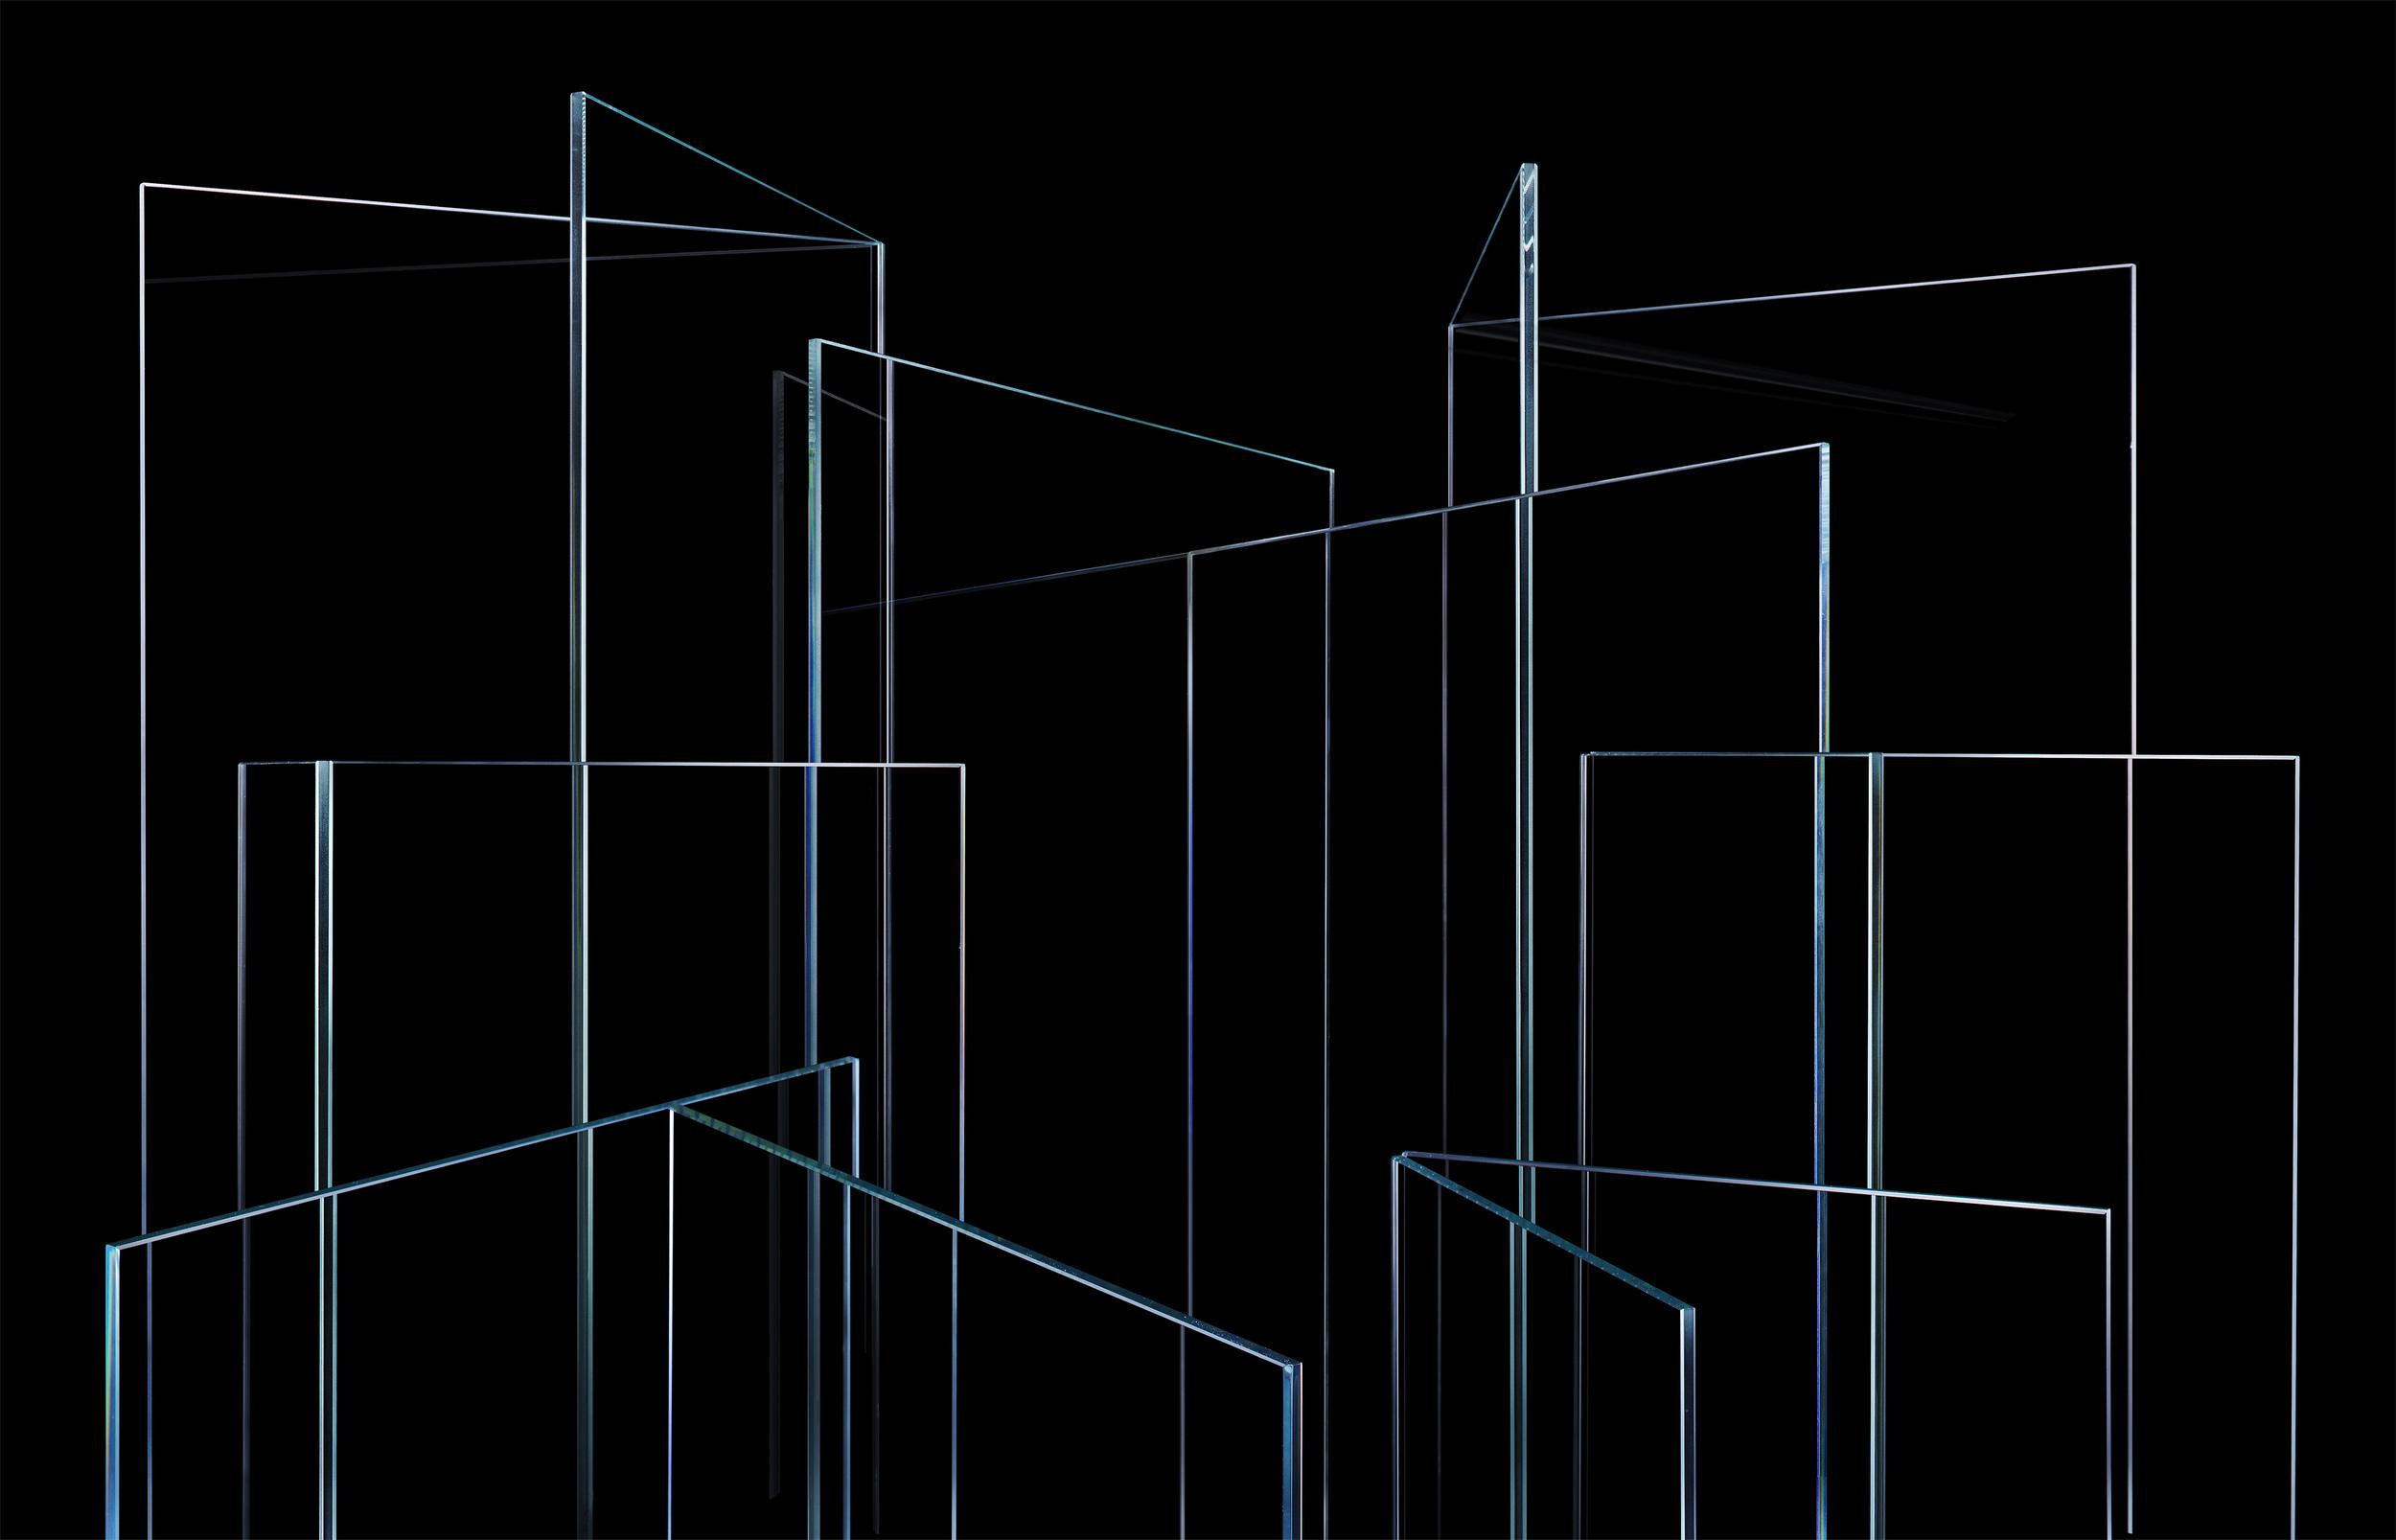 01_glass_tower.jpg